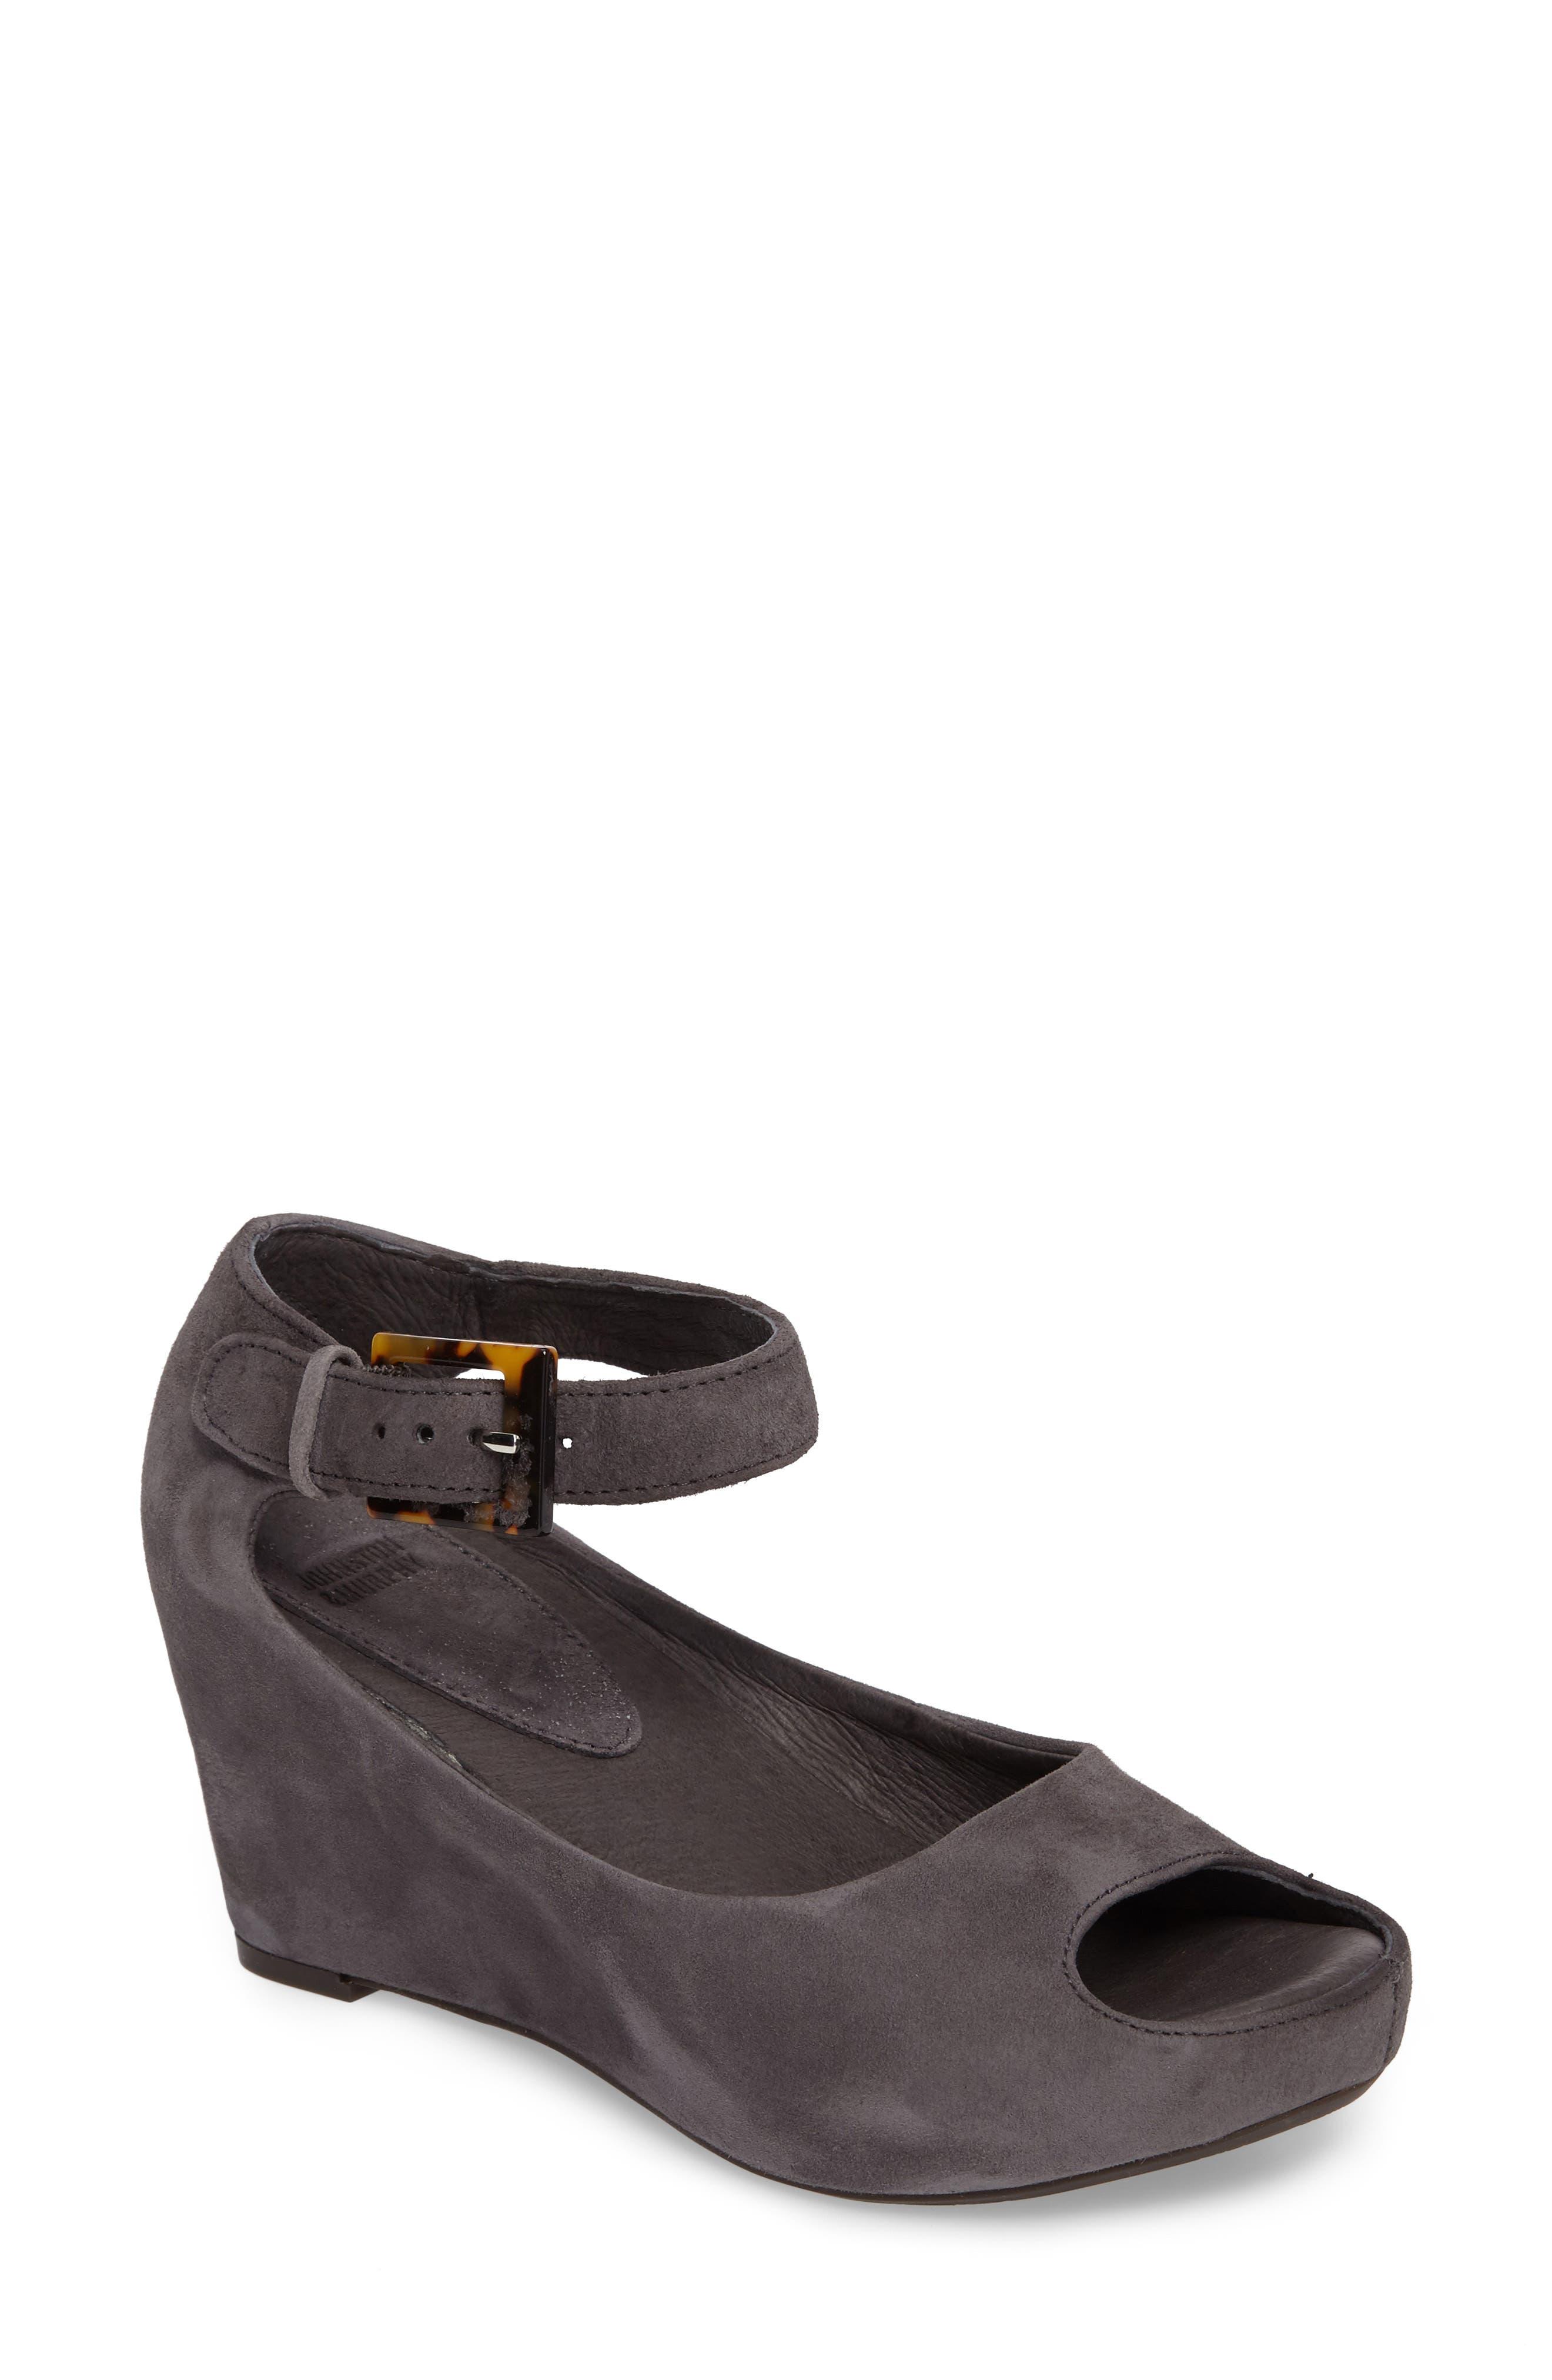 'Tricia' Ankle Strap Sandal,                             Main thumbnail 1, color,